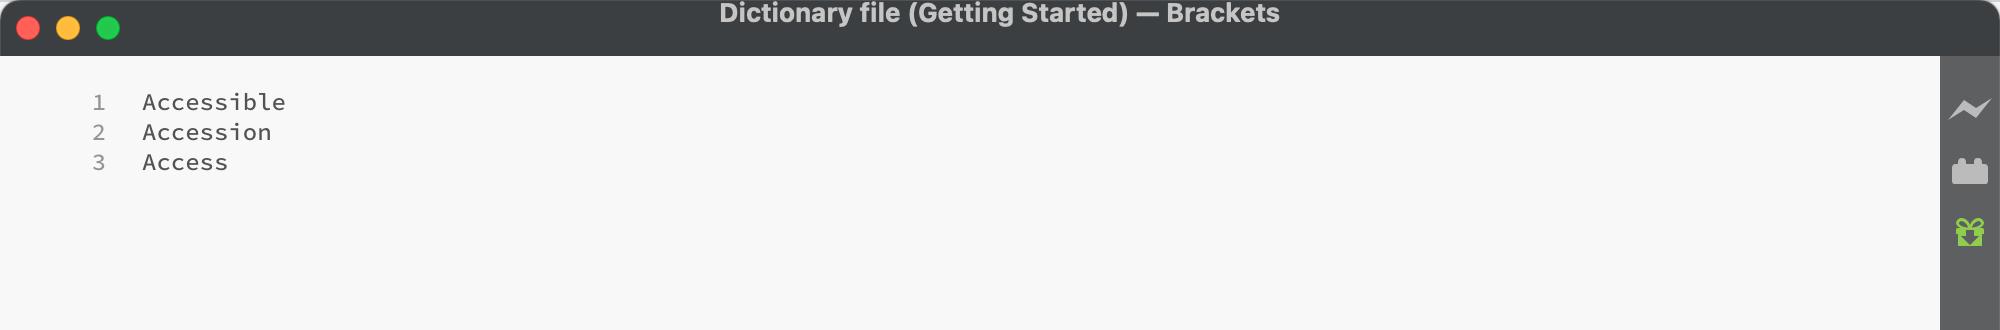 create a dictionary file